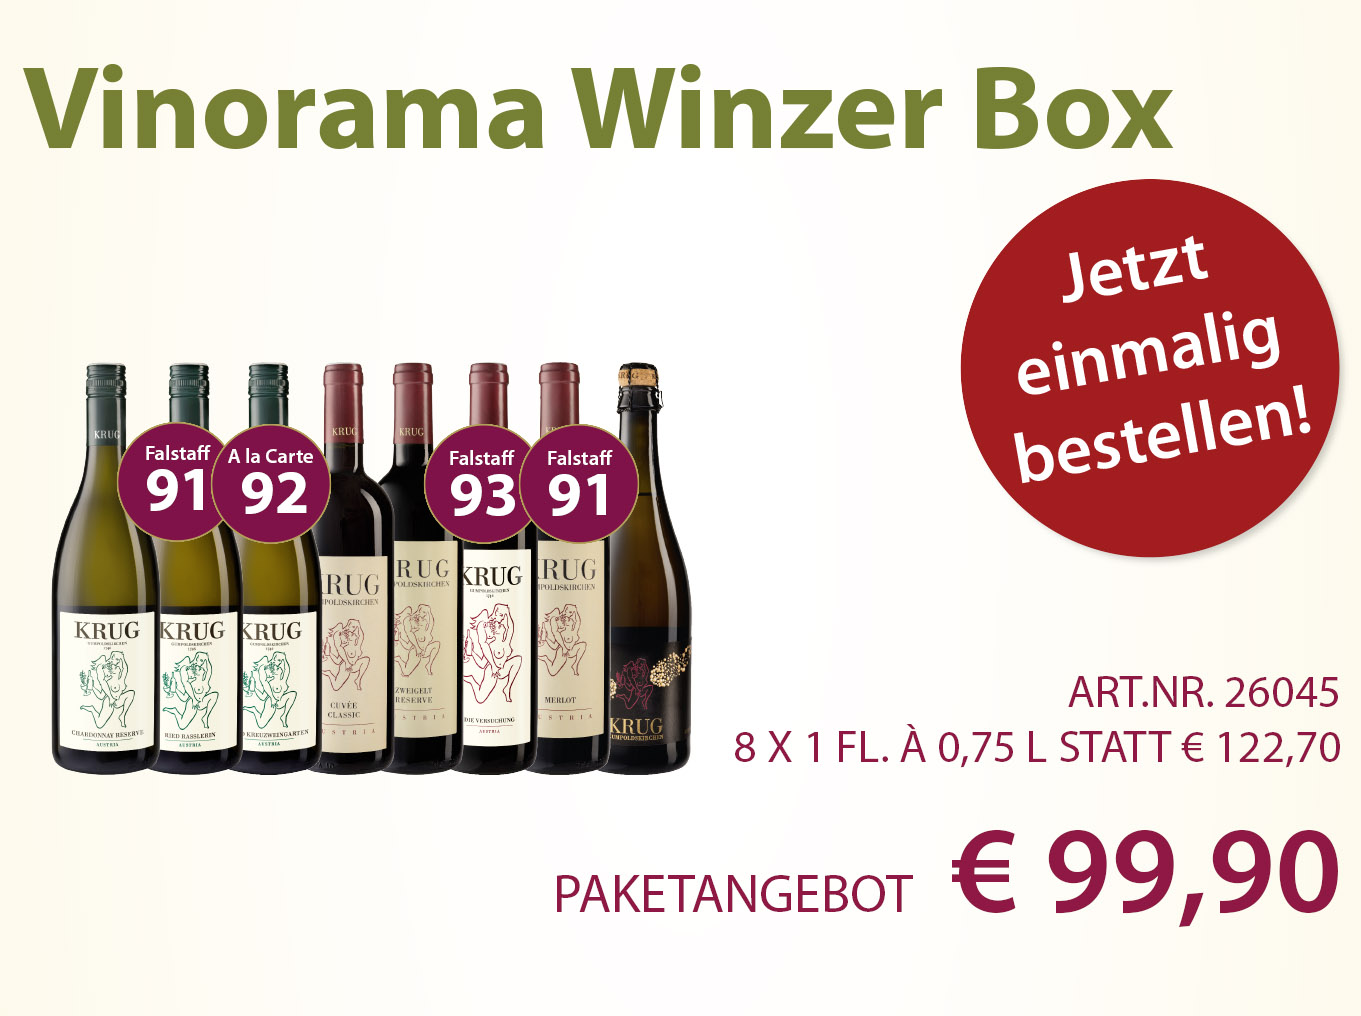 Vinorama Winzer Box einmalig